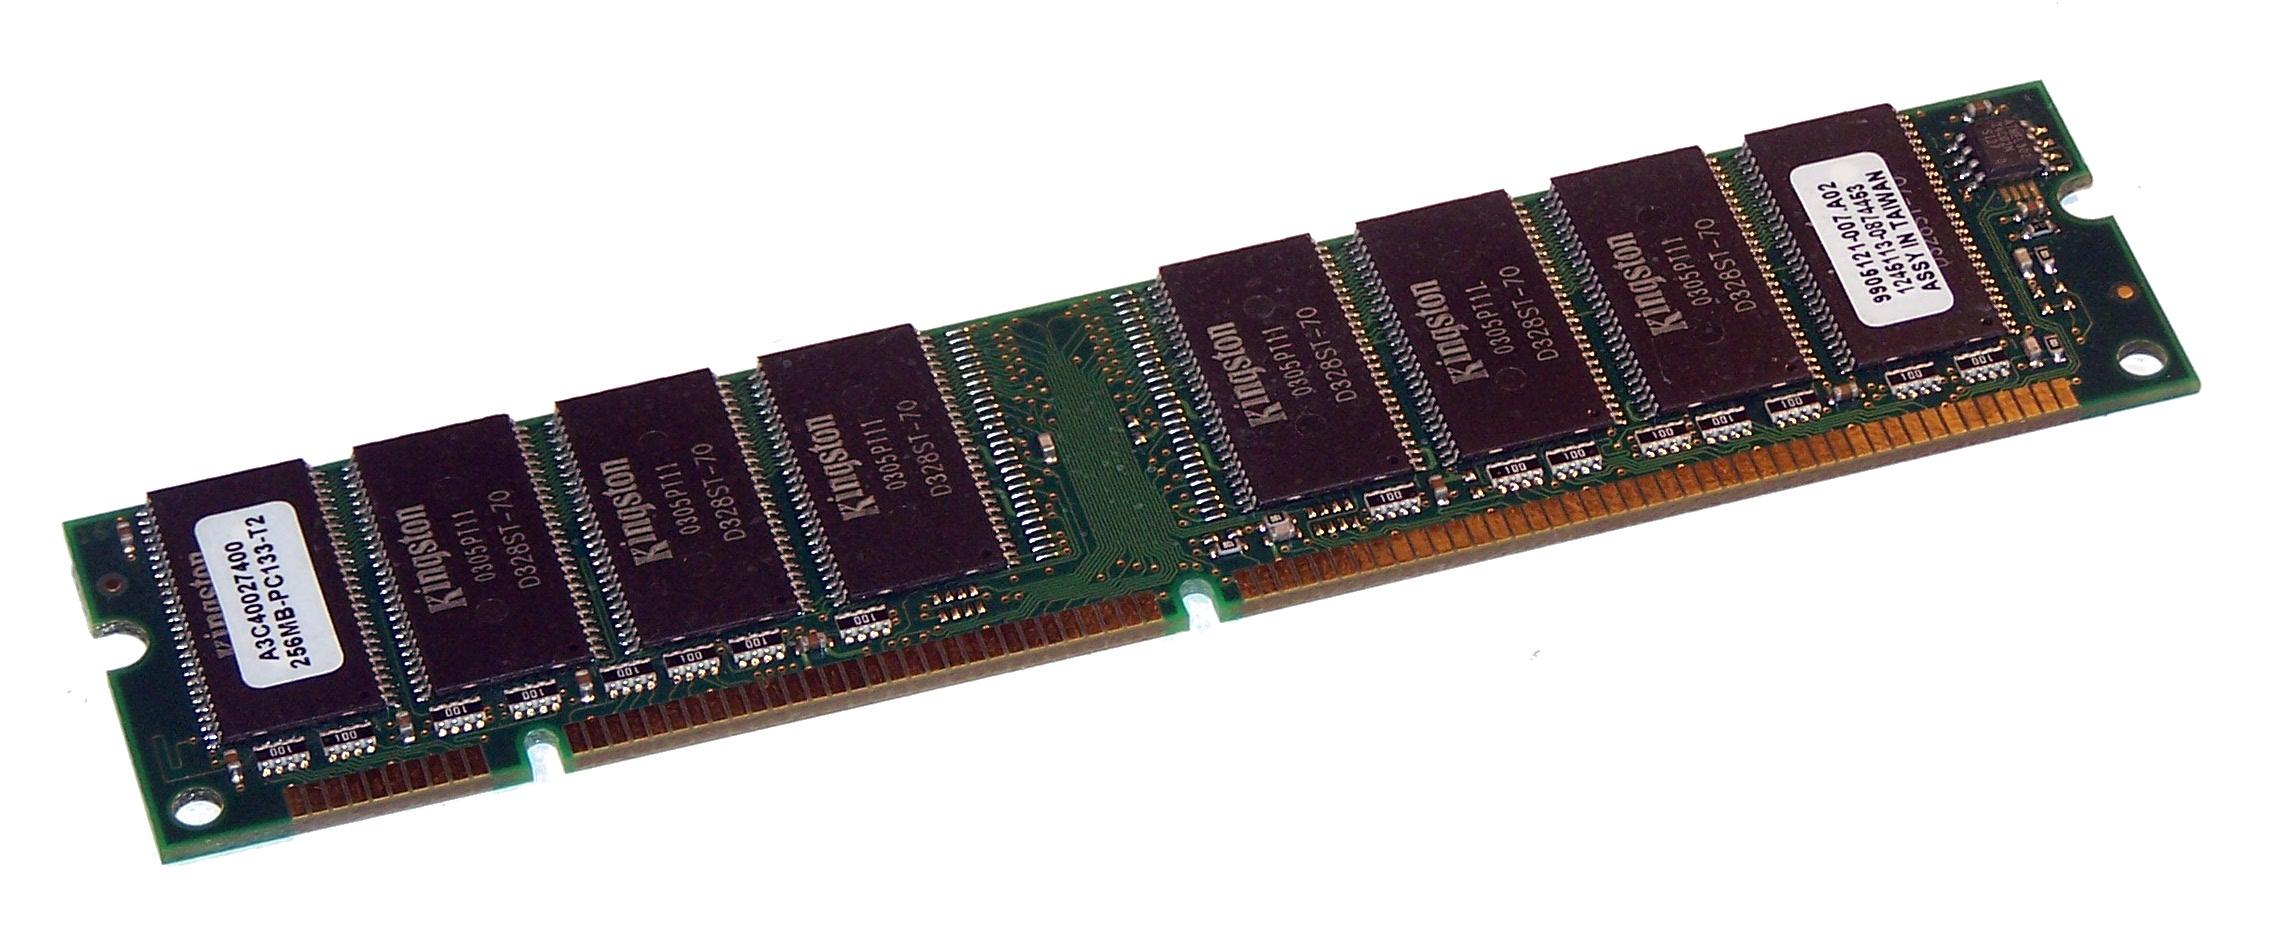 Wincor Nixdorf A3C40027400 (256MB SDRAM PC133U 133MHz DIMM 168-pin) Memory